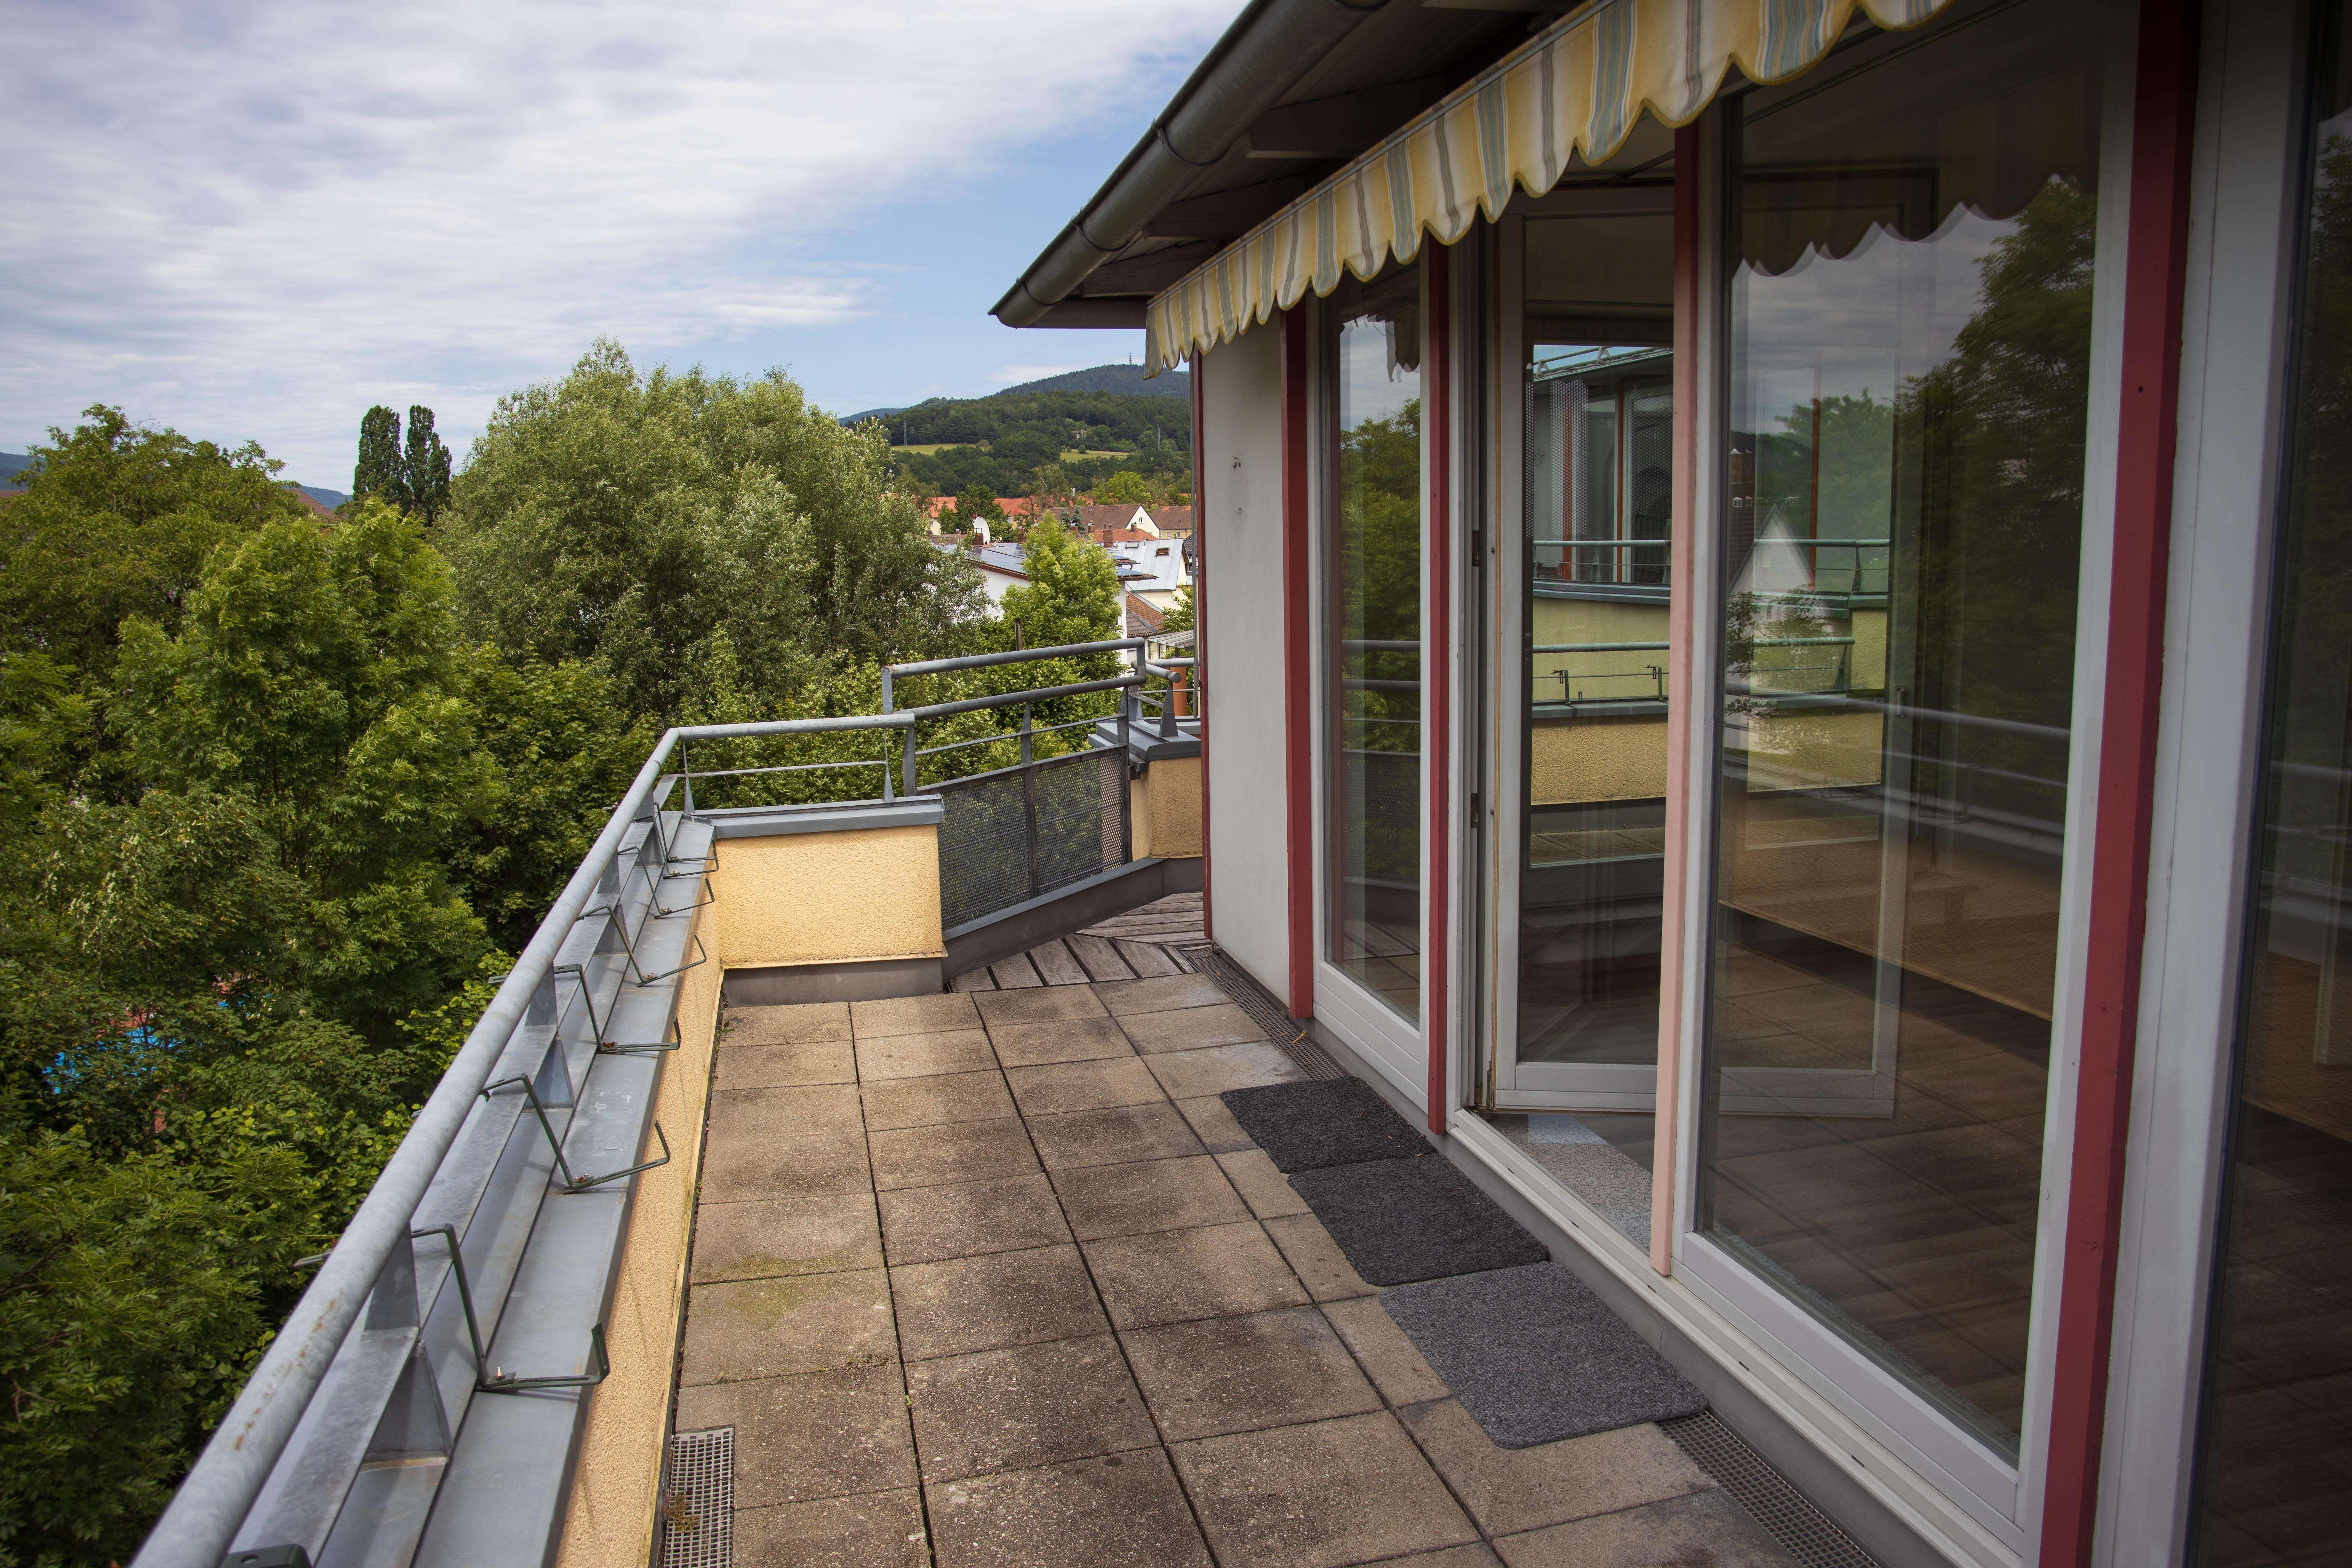 Moderne, zentral gelegene, Penthousewohnung in Deggendorf in Deggendorf